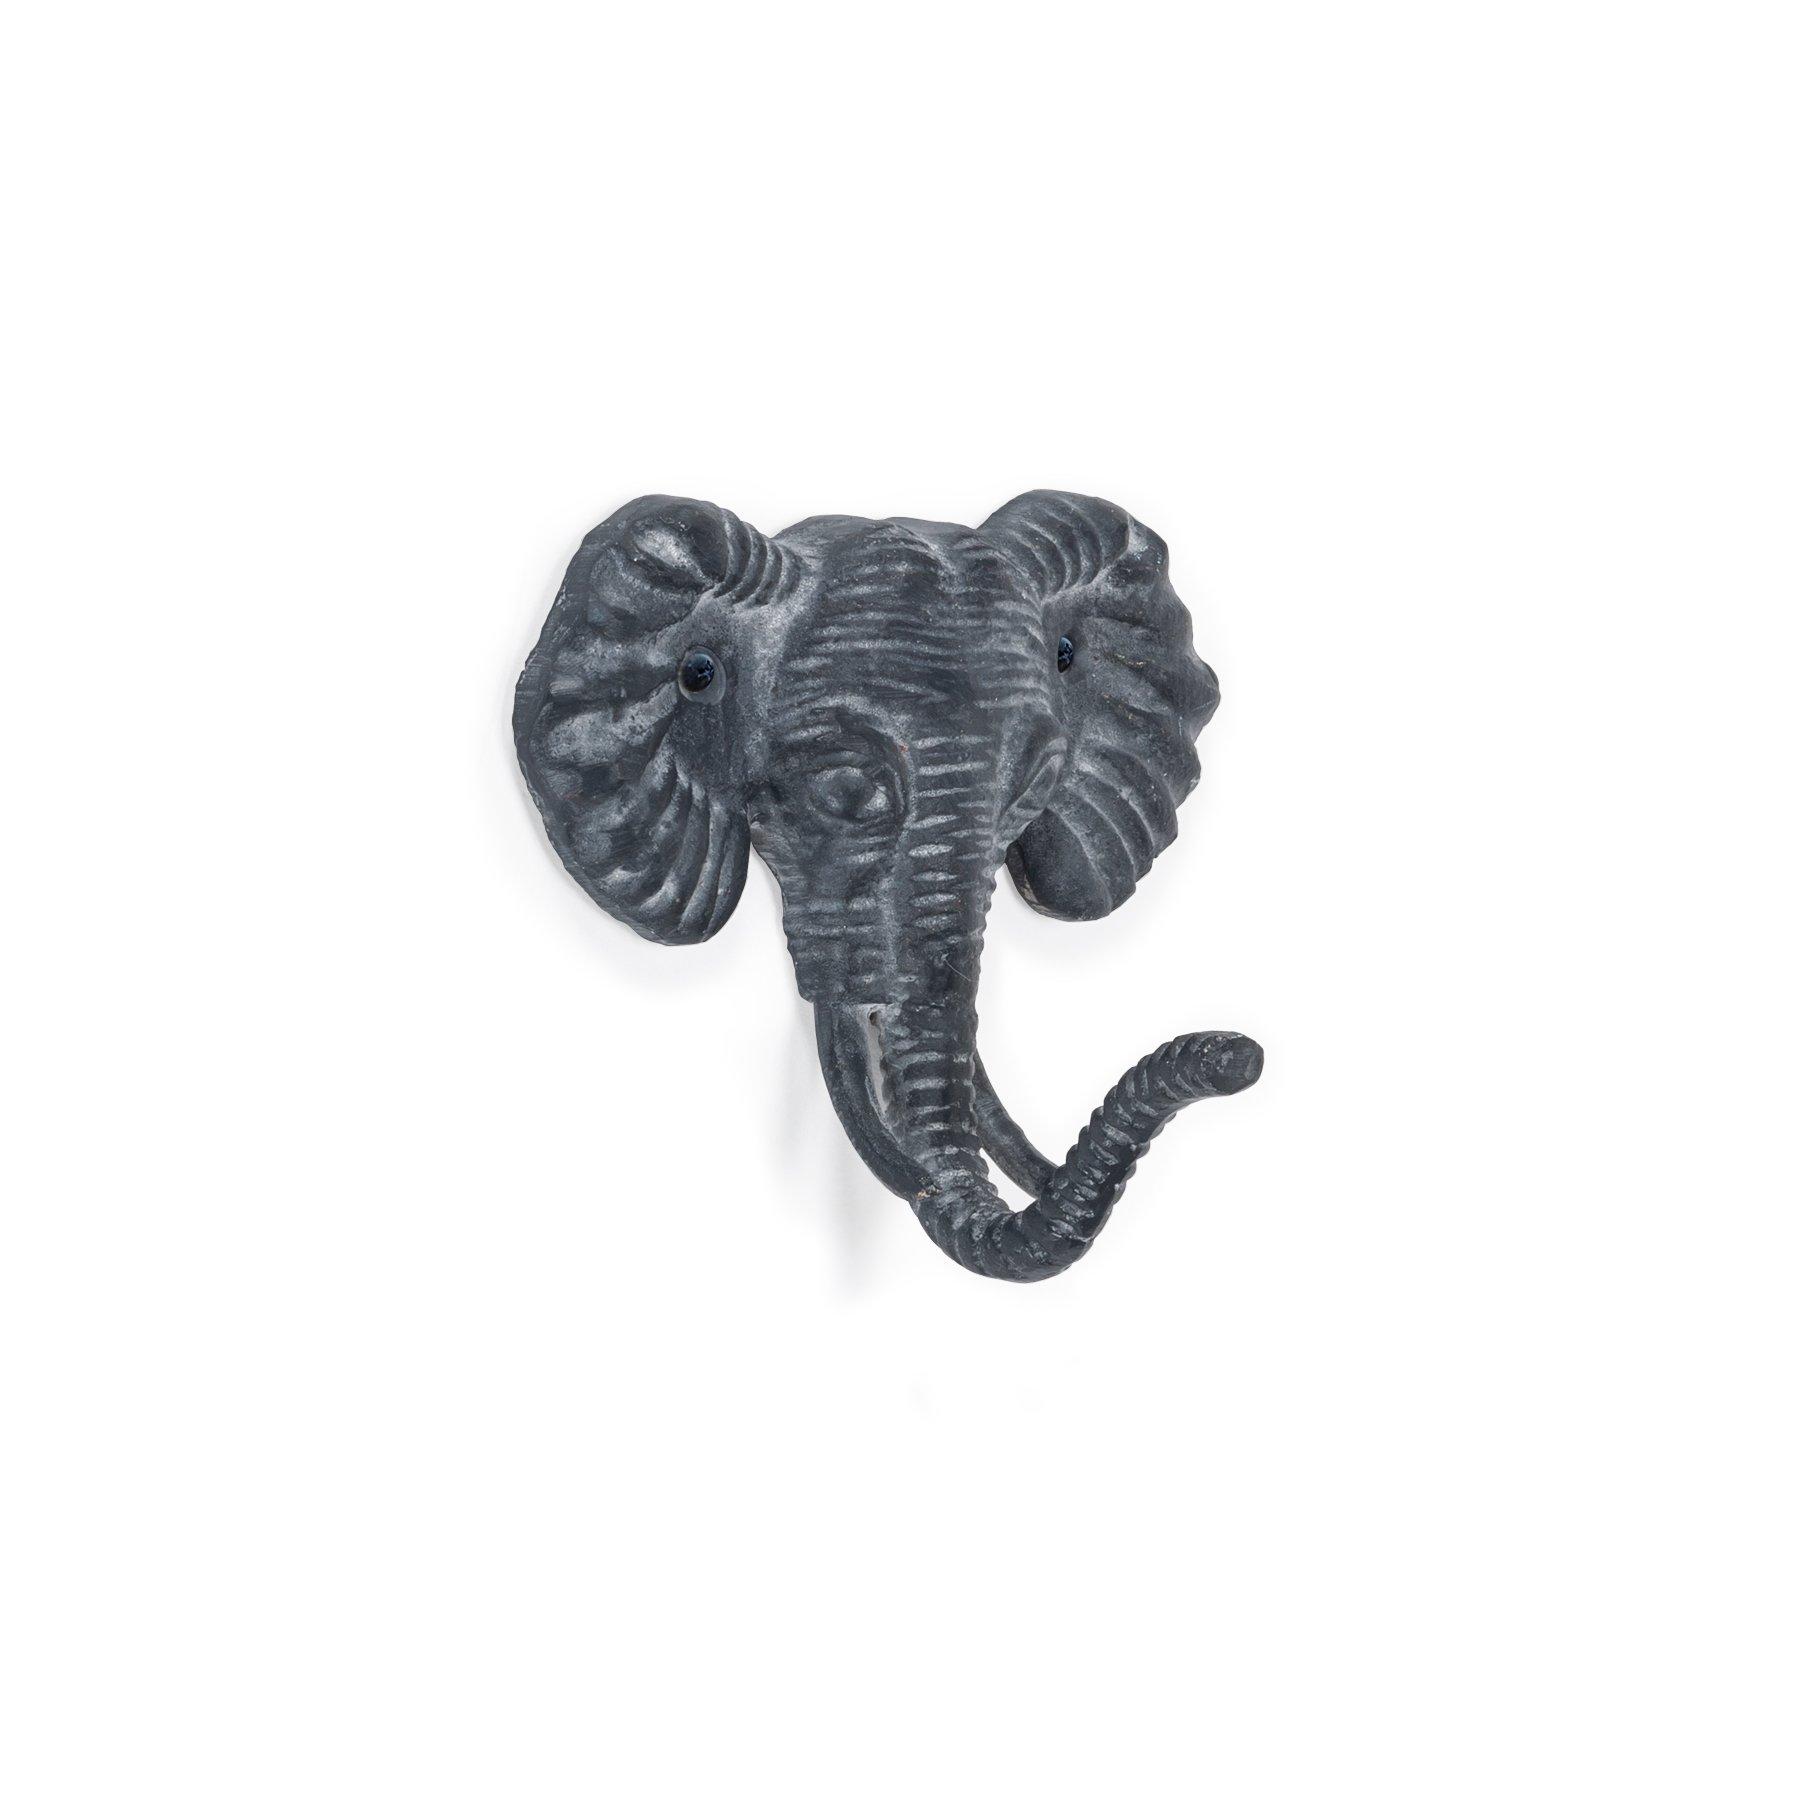 Abbott Collection Cast Iron Elephant Head Wall Hook